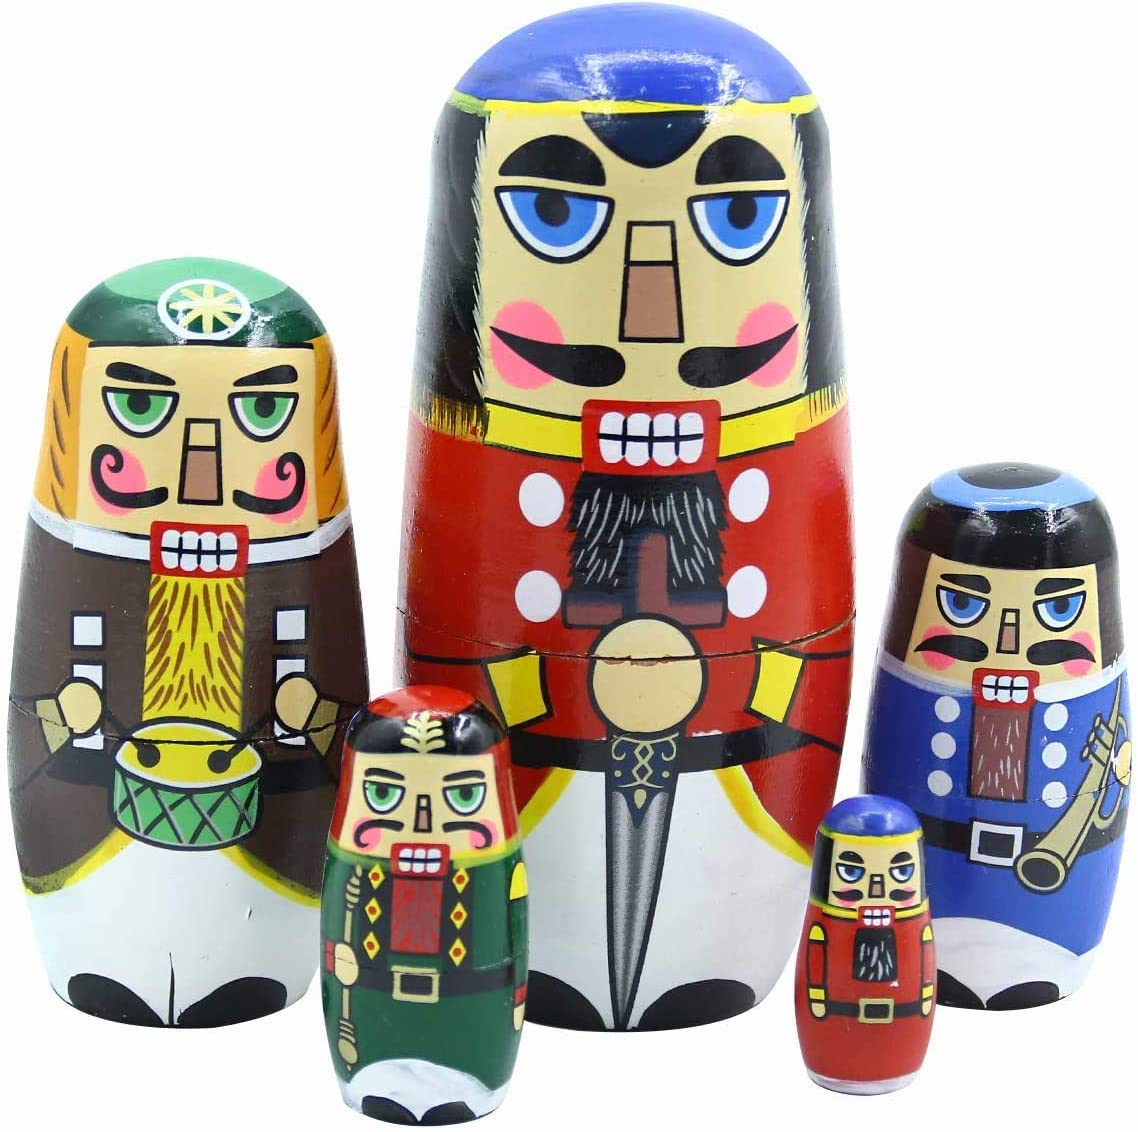 Kakeah Nutcracker Nesting Dolls Wooden Doll Long-awaited 25% OFF Russian Matryoshka H